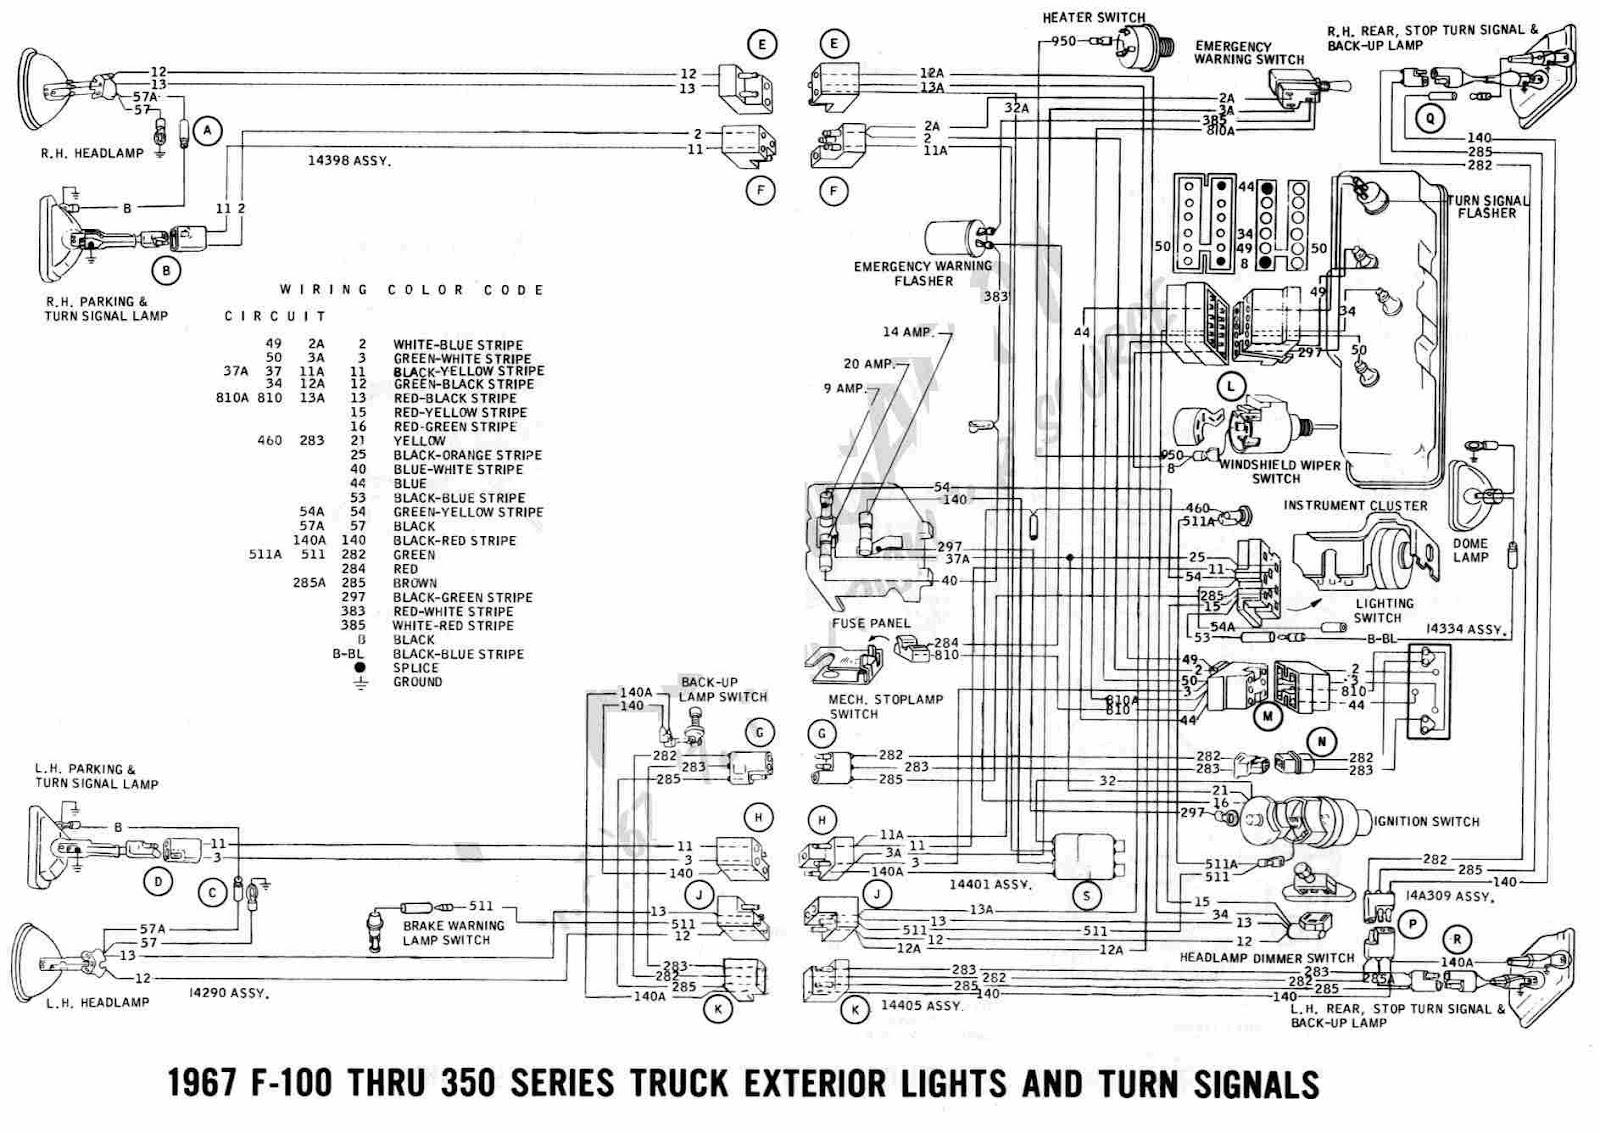 Miraculous Triton Snowmobile Trailer Wiring Diagram Wiring Diagram Wiring Cloud Waroletkolfr09Org